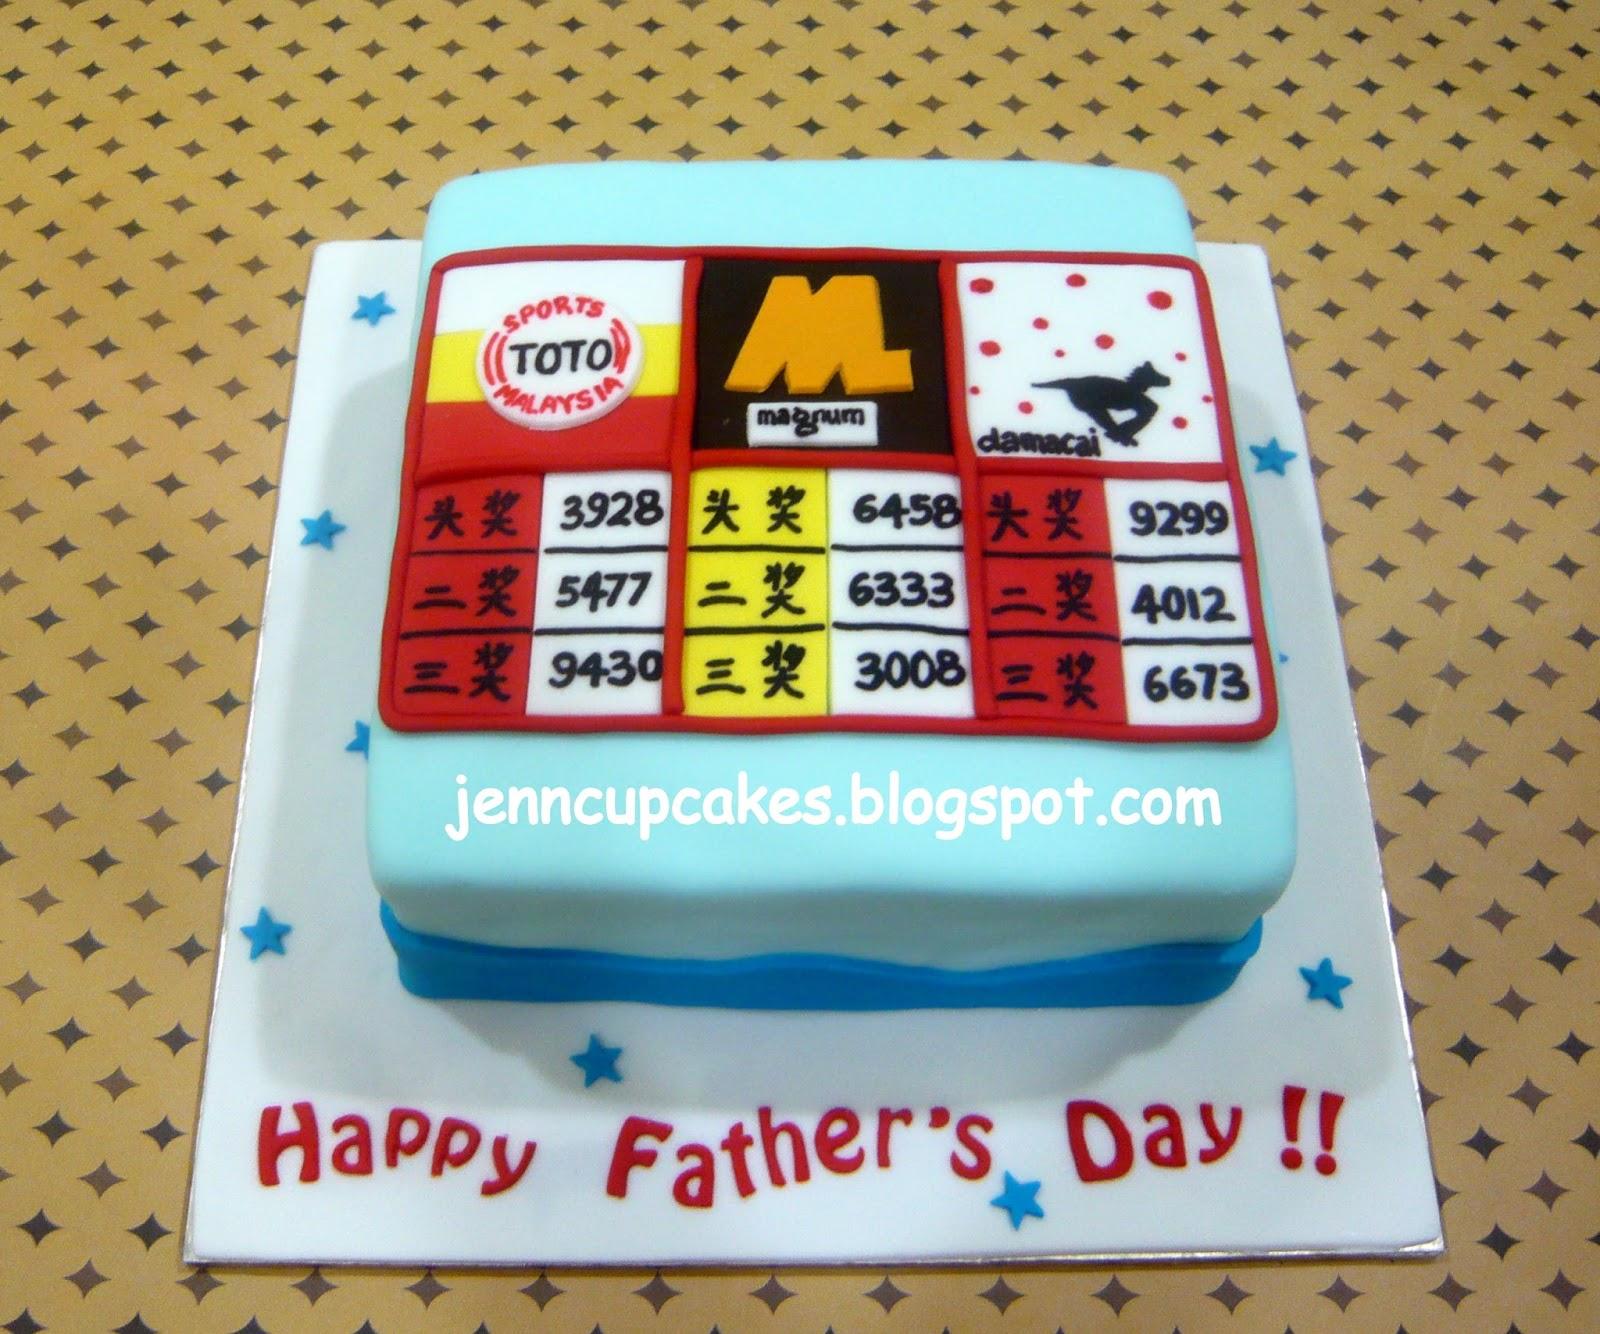 Jenn Cupcakes & Muffins: Magnum Toto Cake